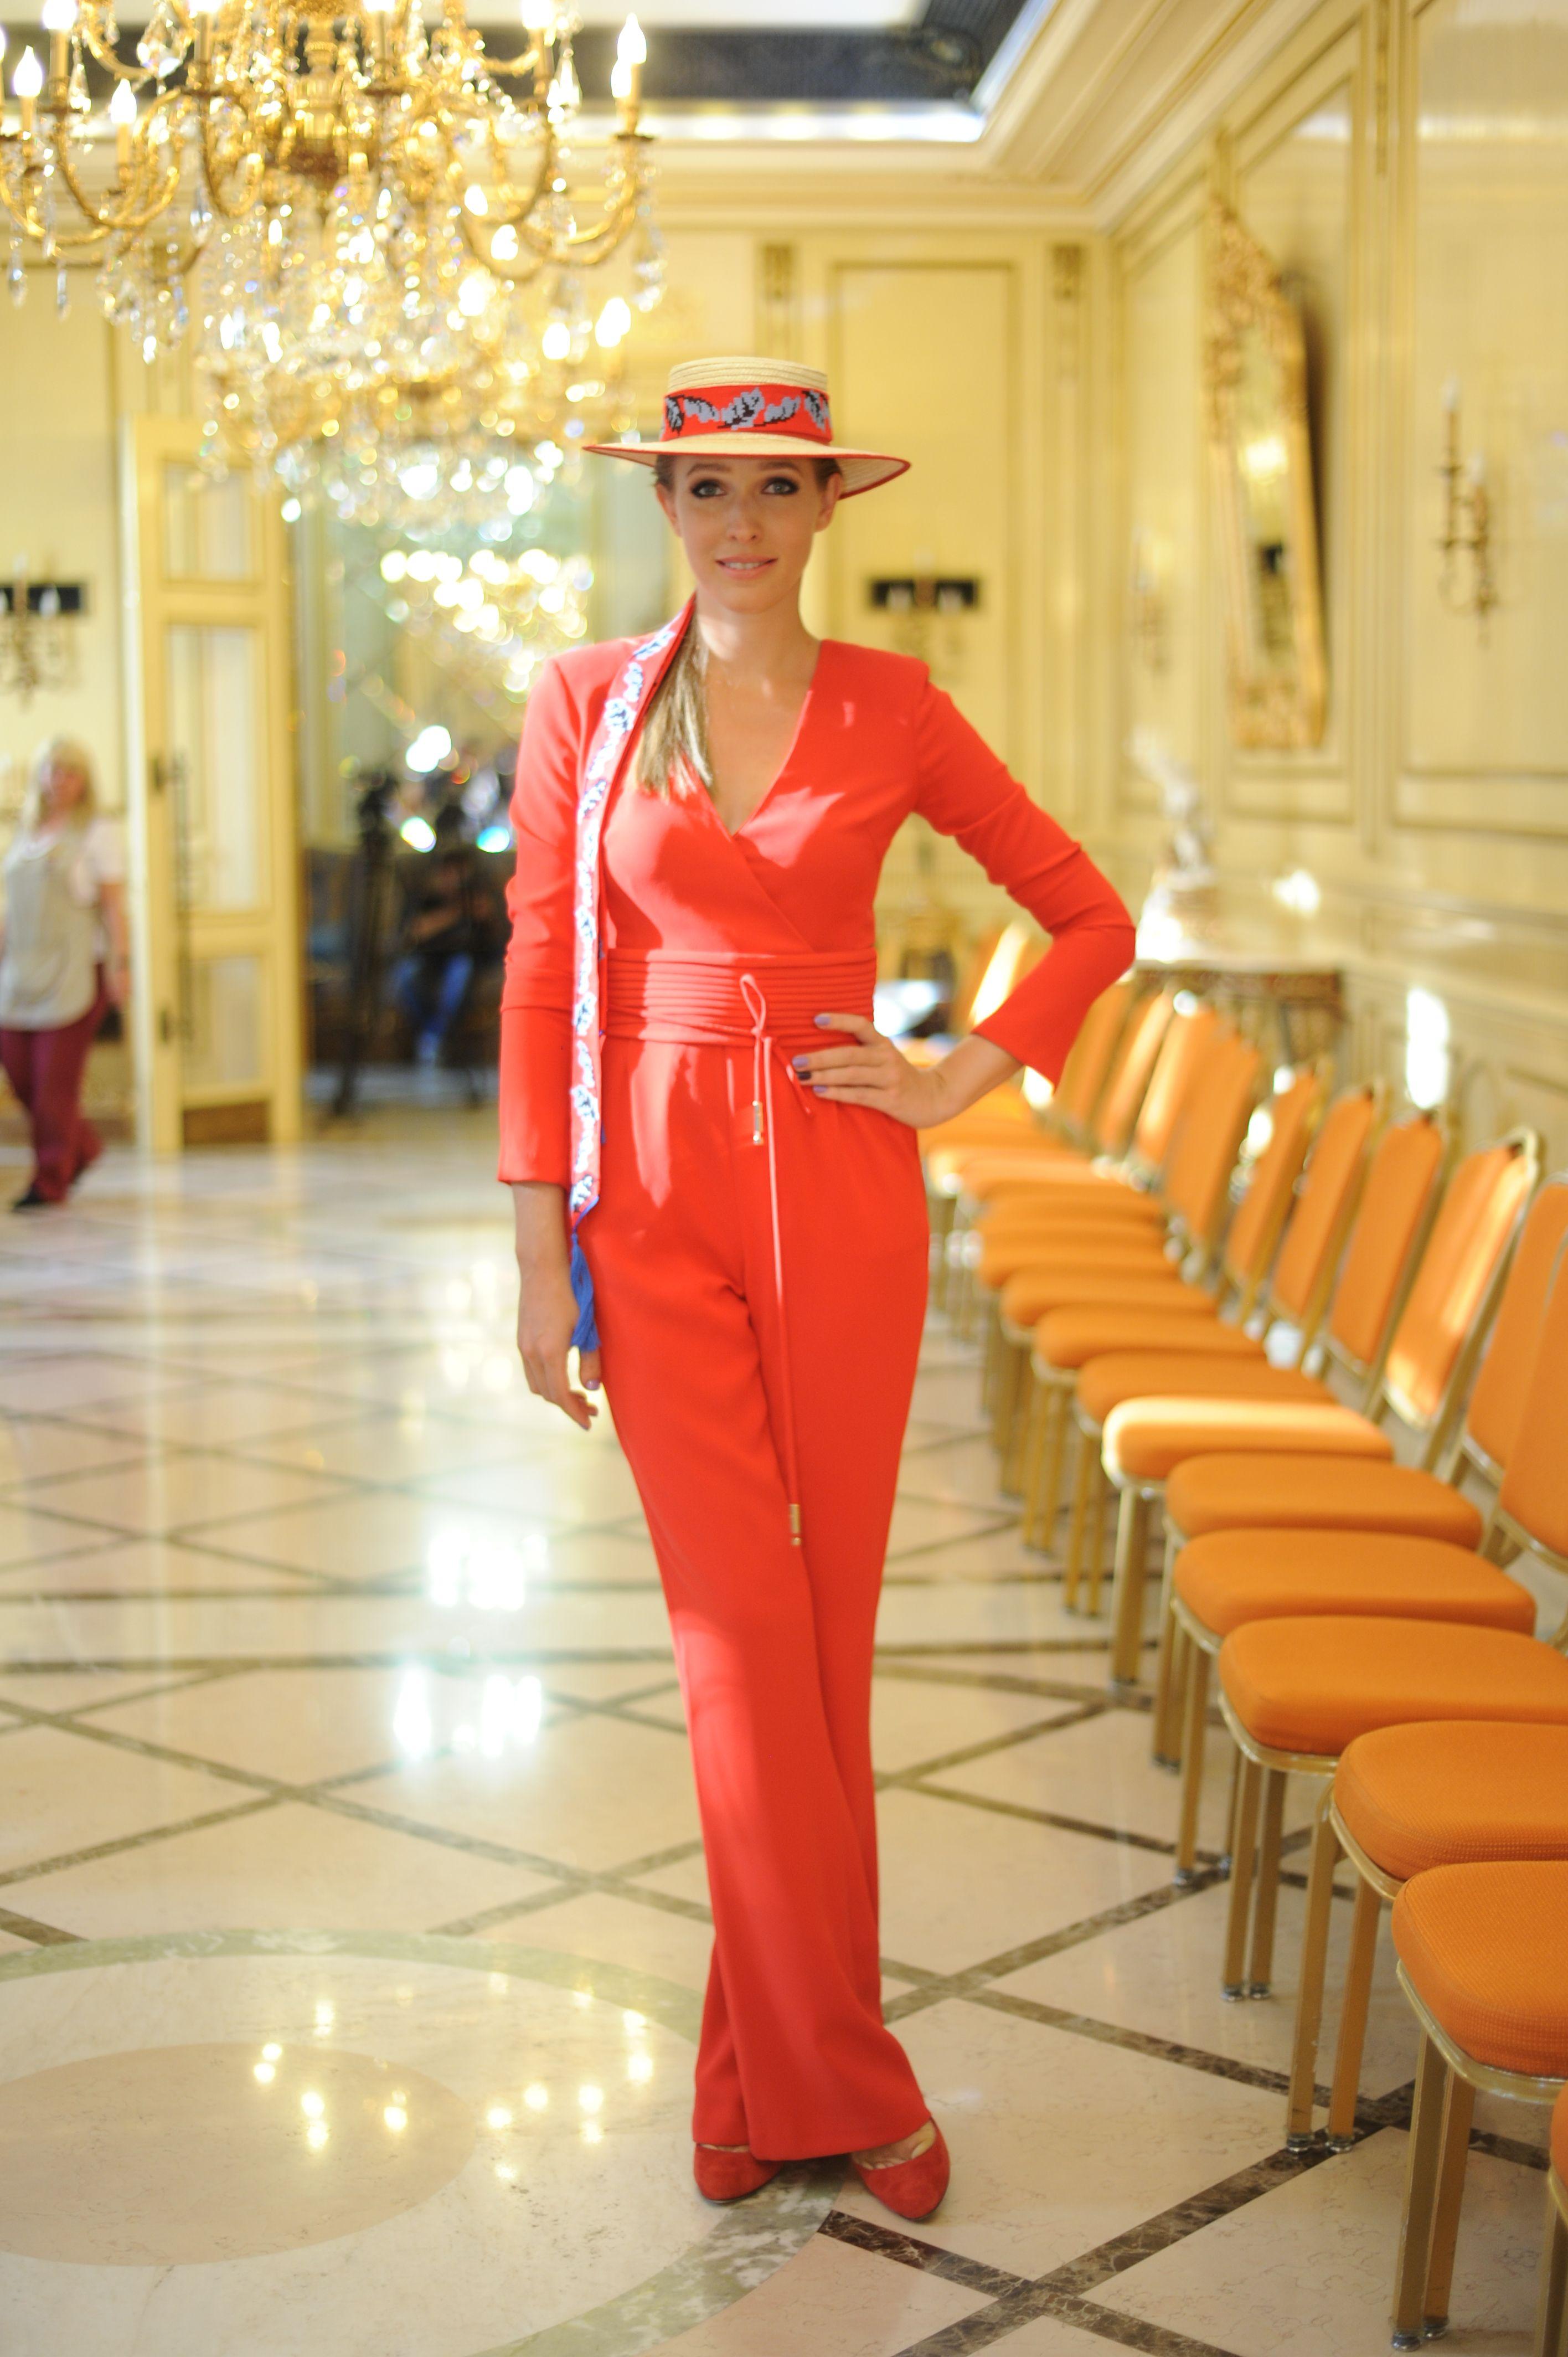 Катя Осадчая, Марыся Горобец, Надя Дорофеева и другие звезды на показах Odessa Holiday Fashion Week